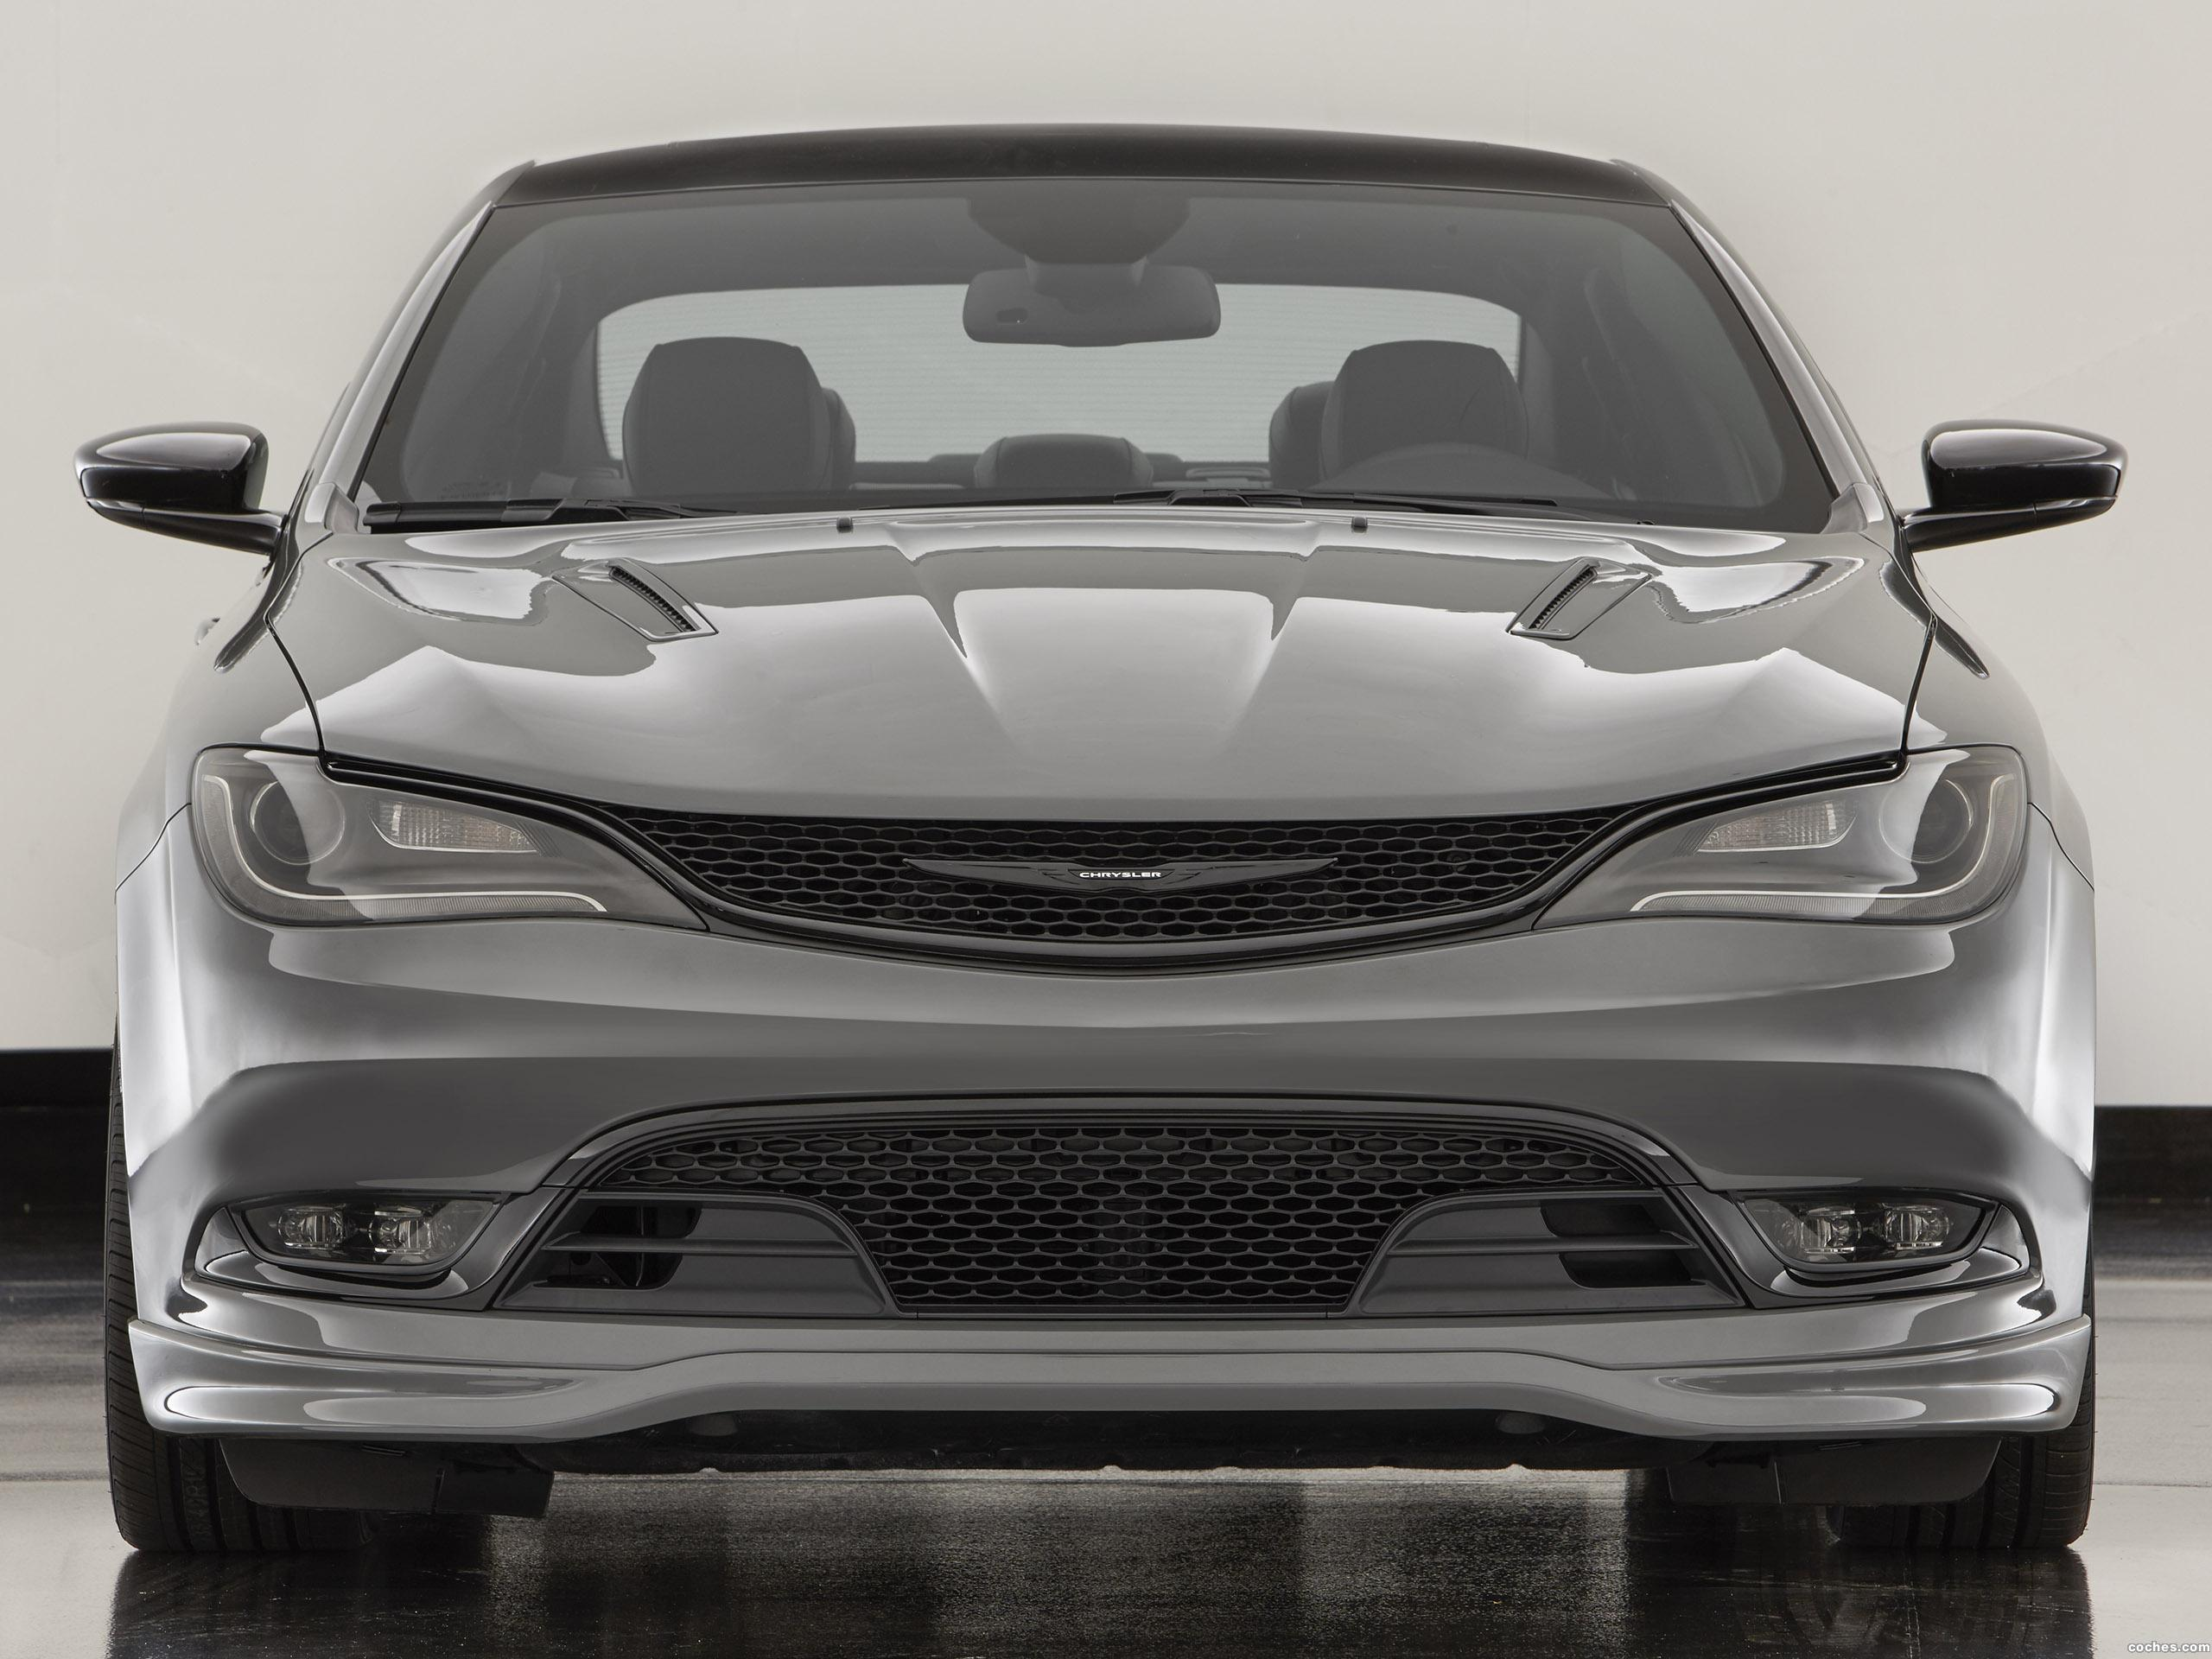 Foto 0 de Mopar Chrysler 200 S 2015